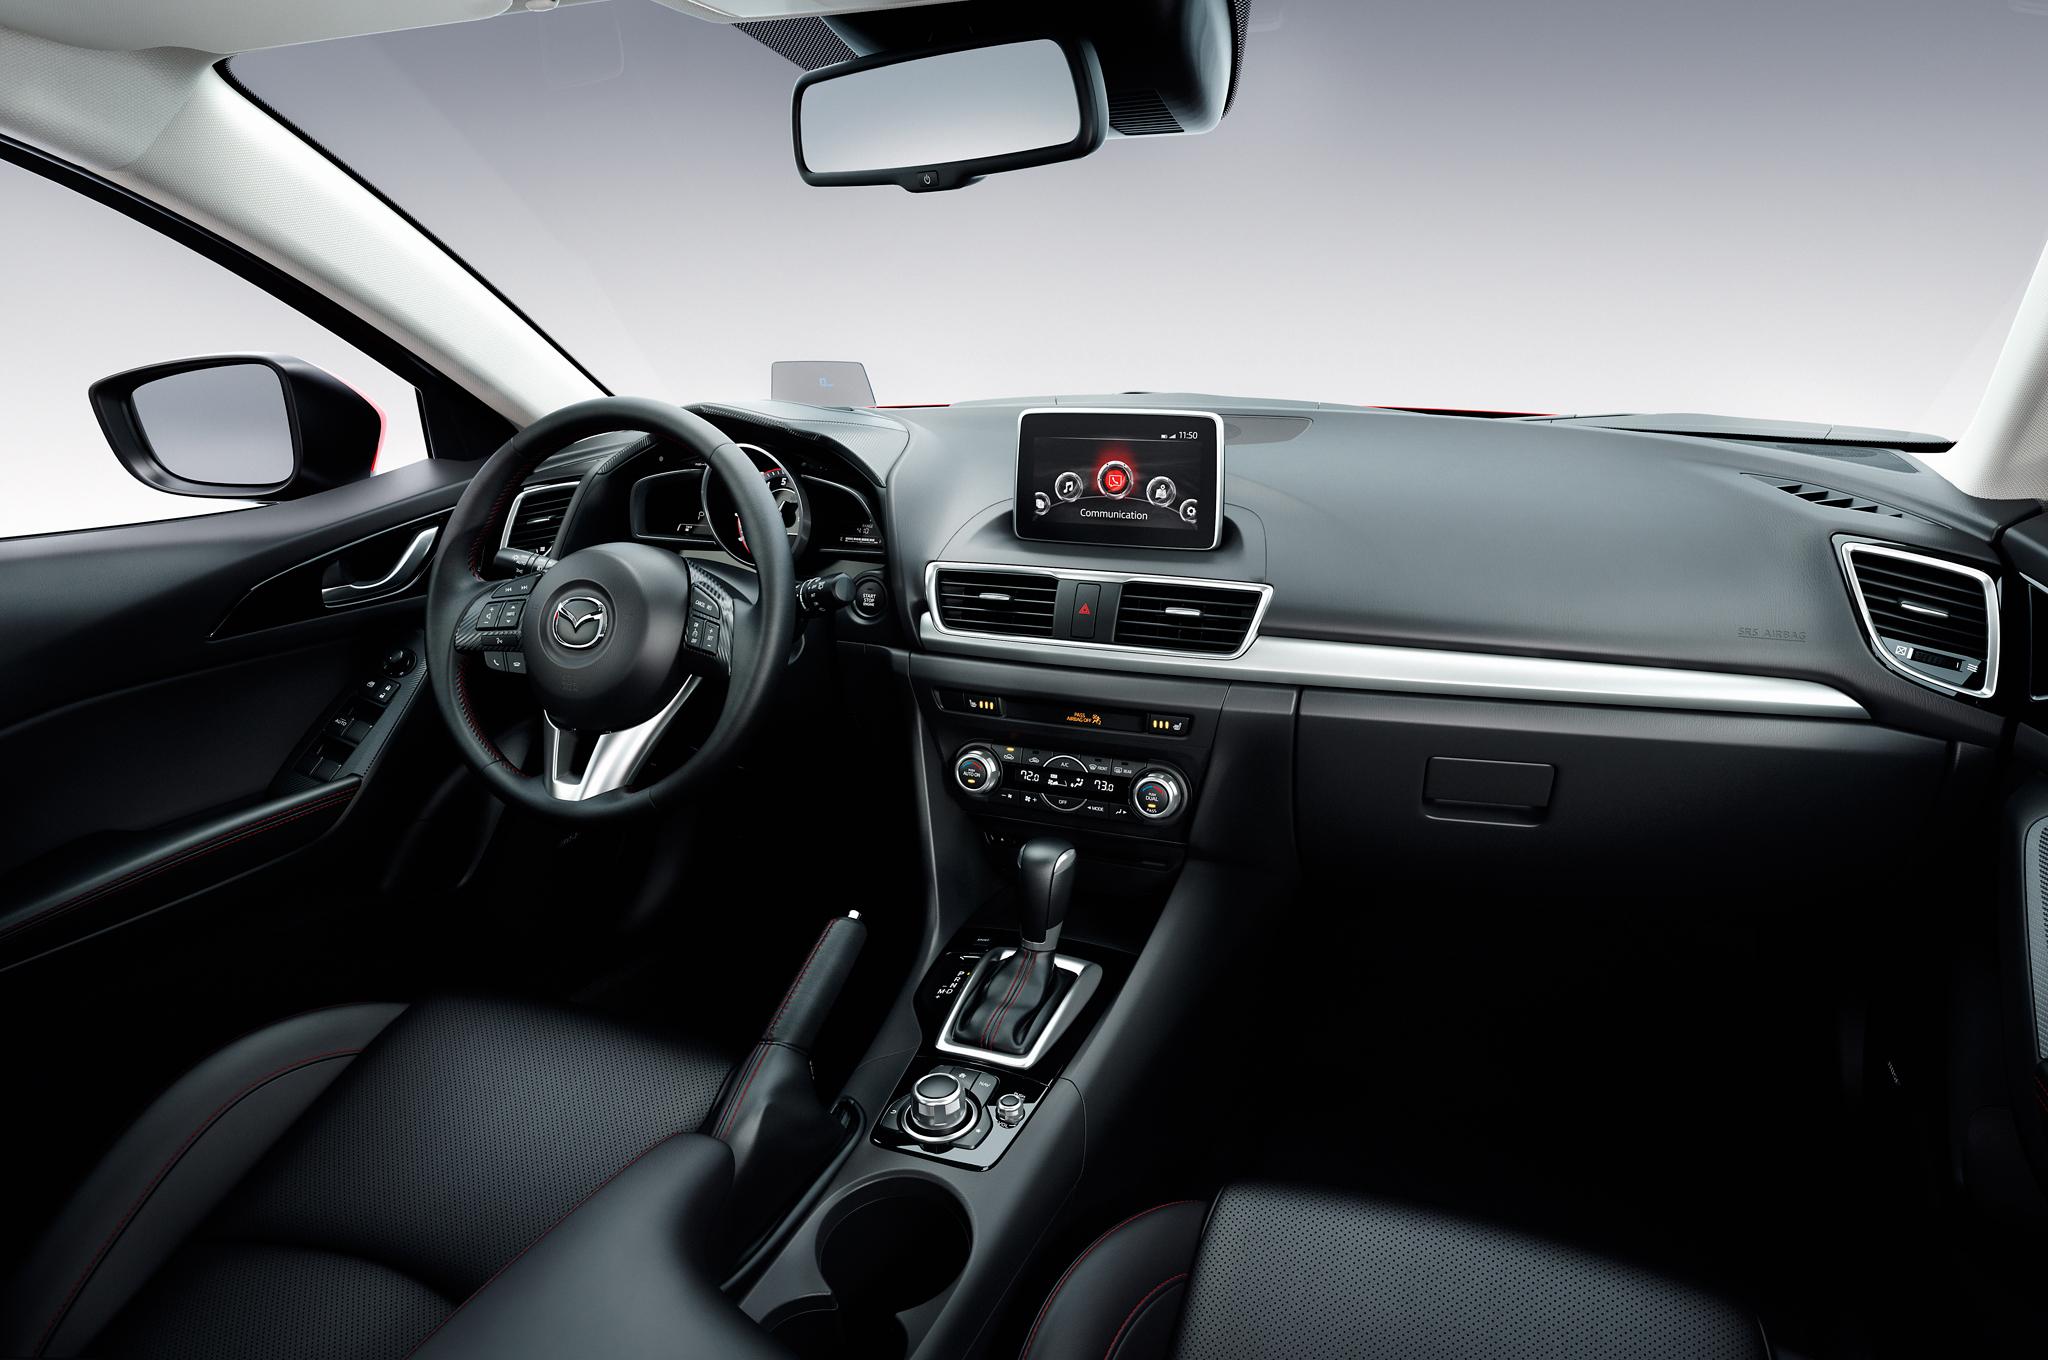 2014 Mazda 3 Pics, Vehicles Collection